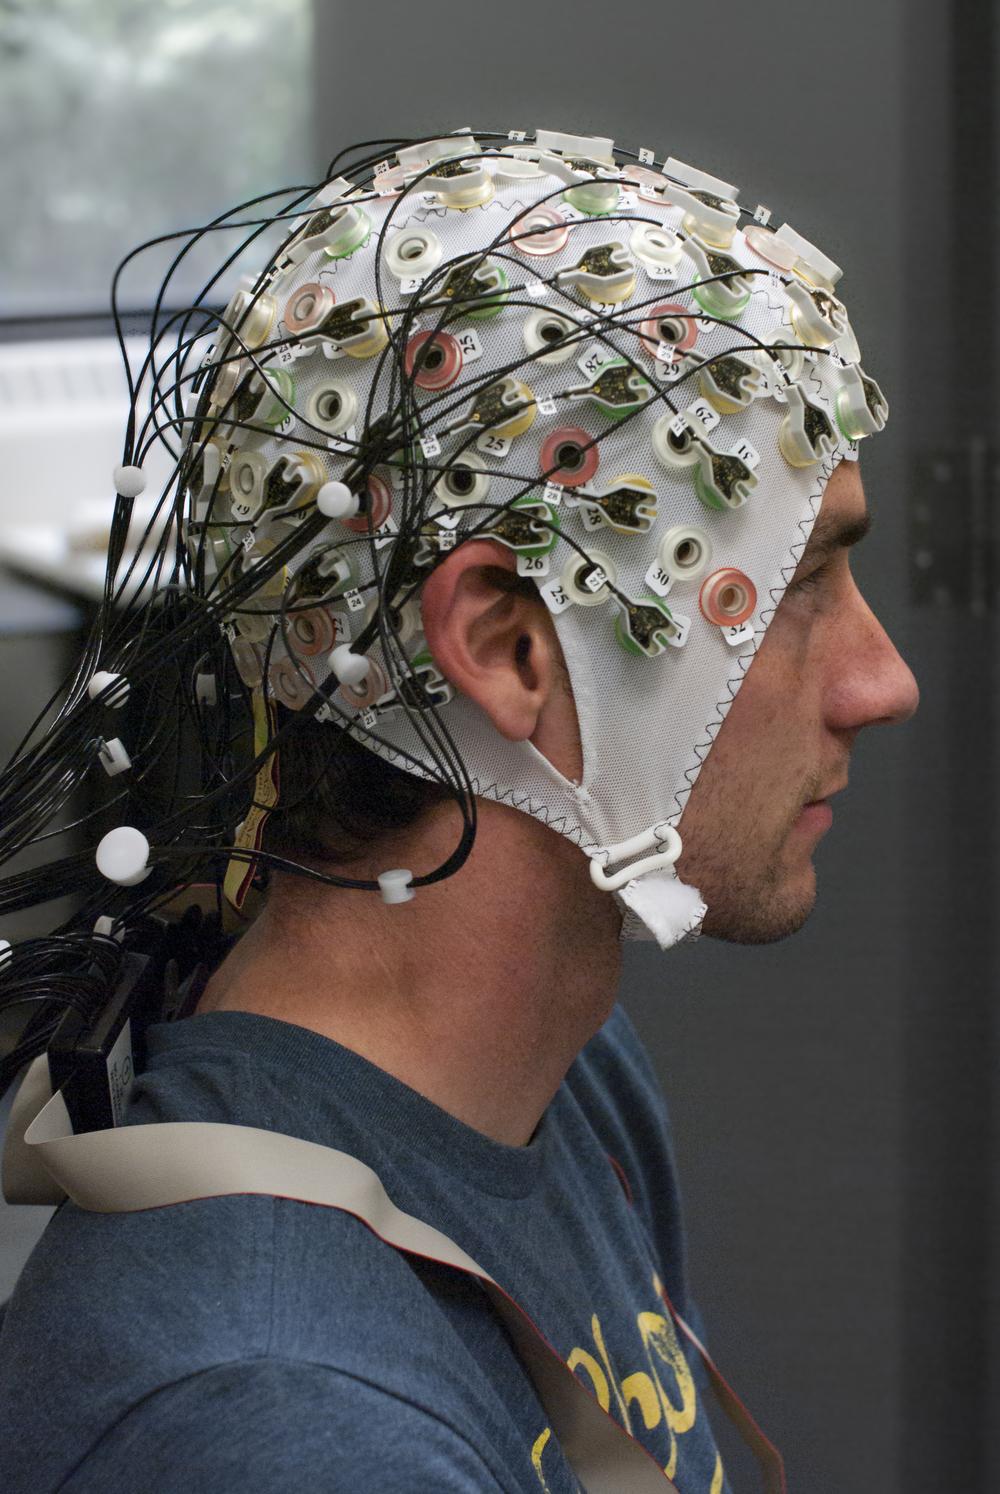 EEG Cap Setup